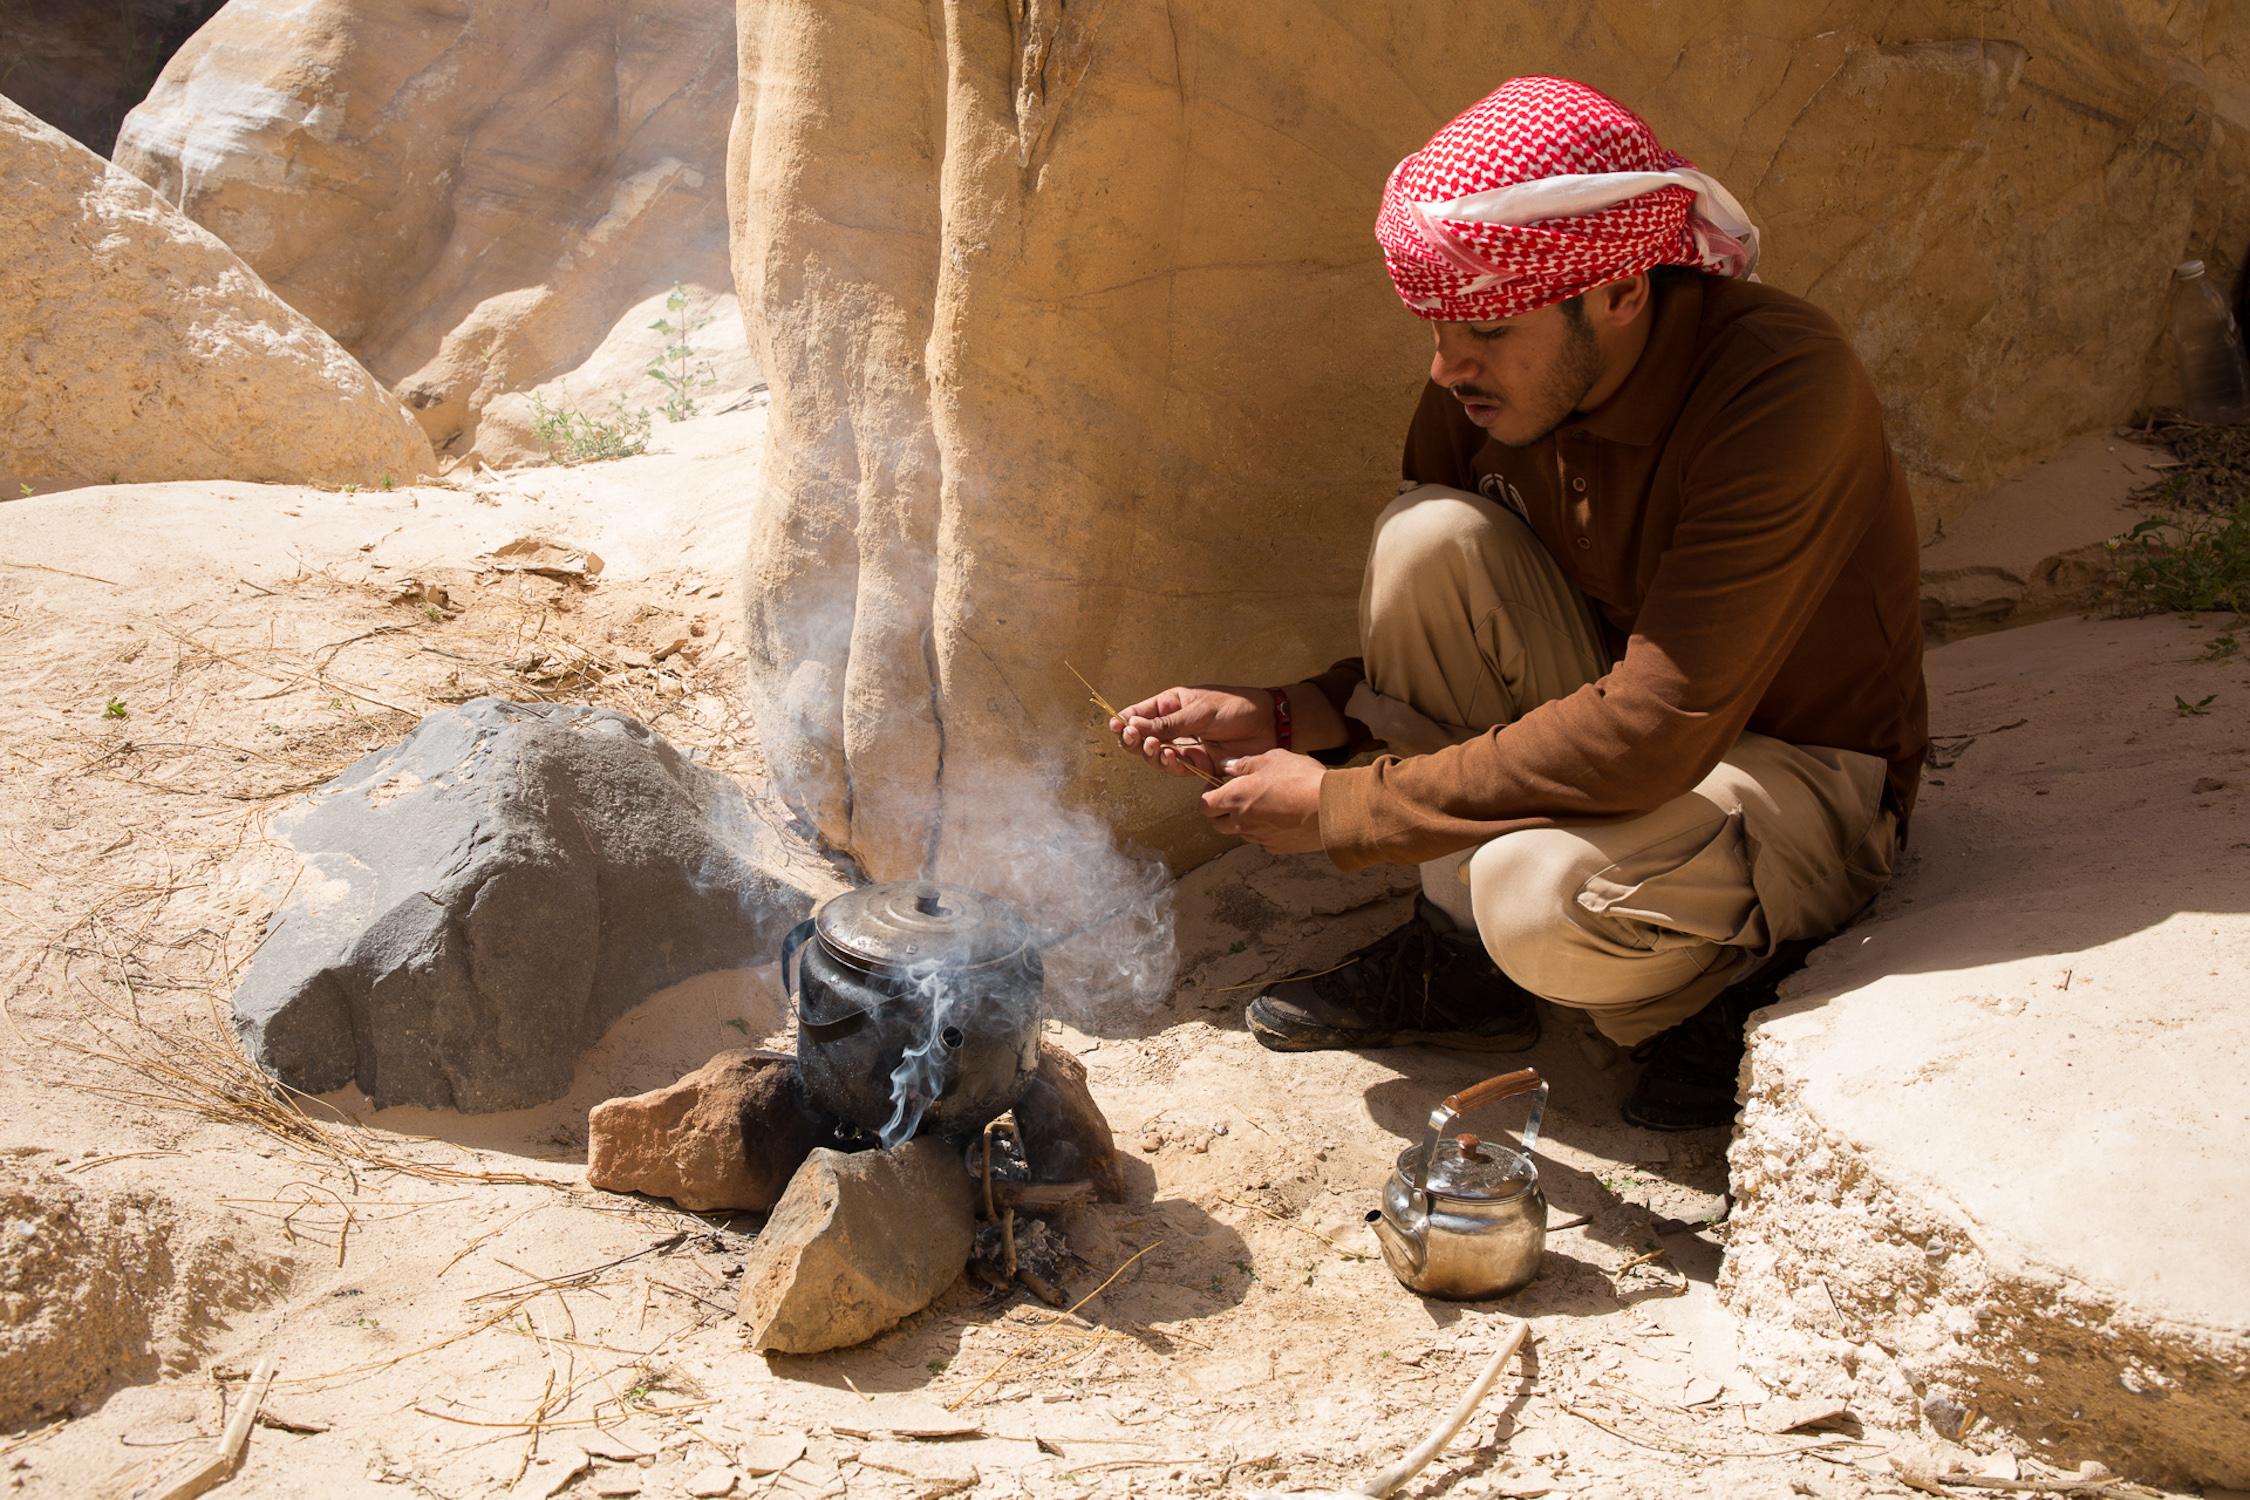 Bedouin Guide Preparing Tea